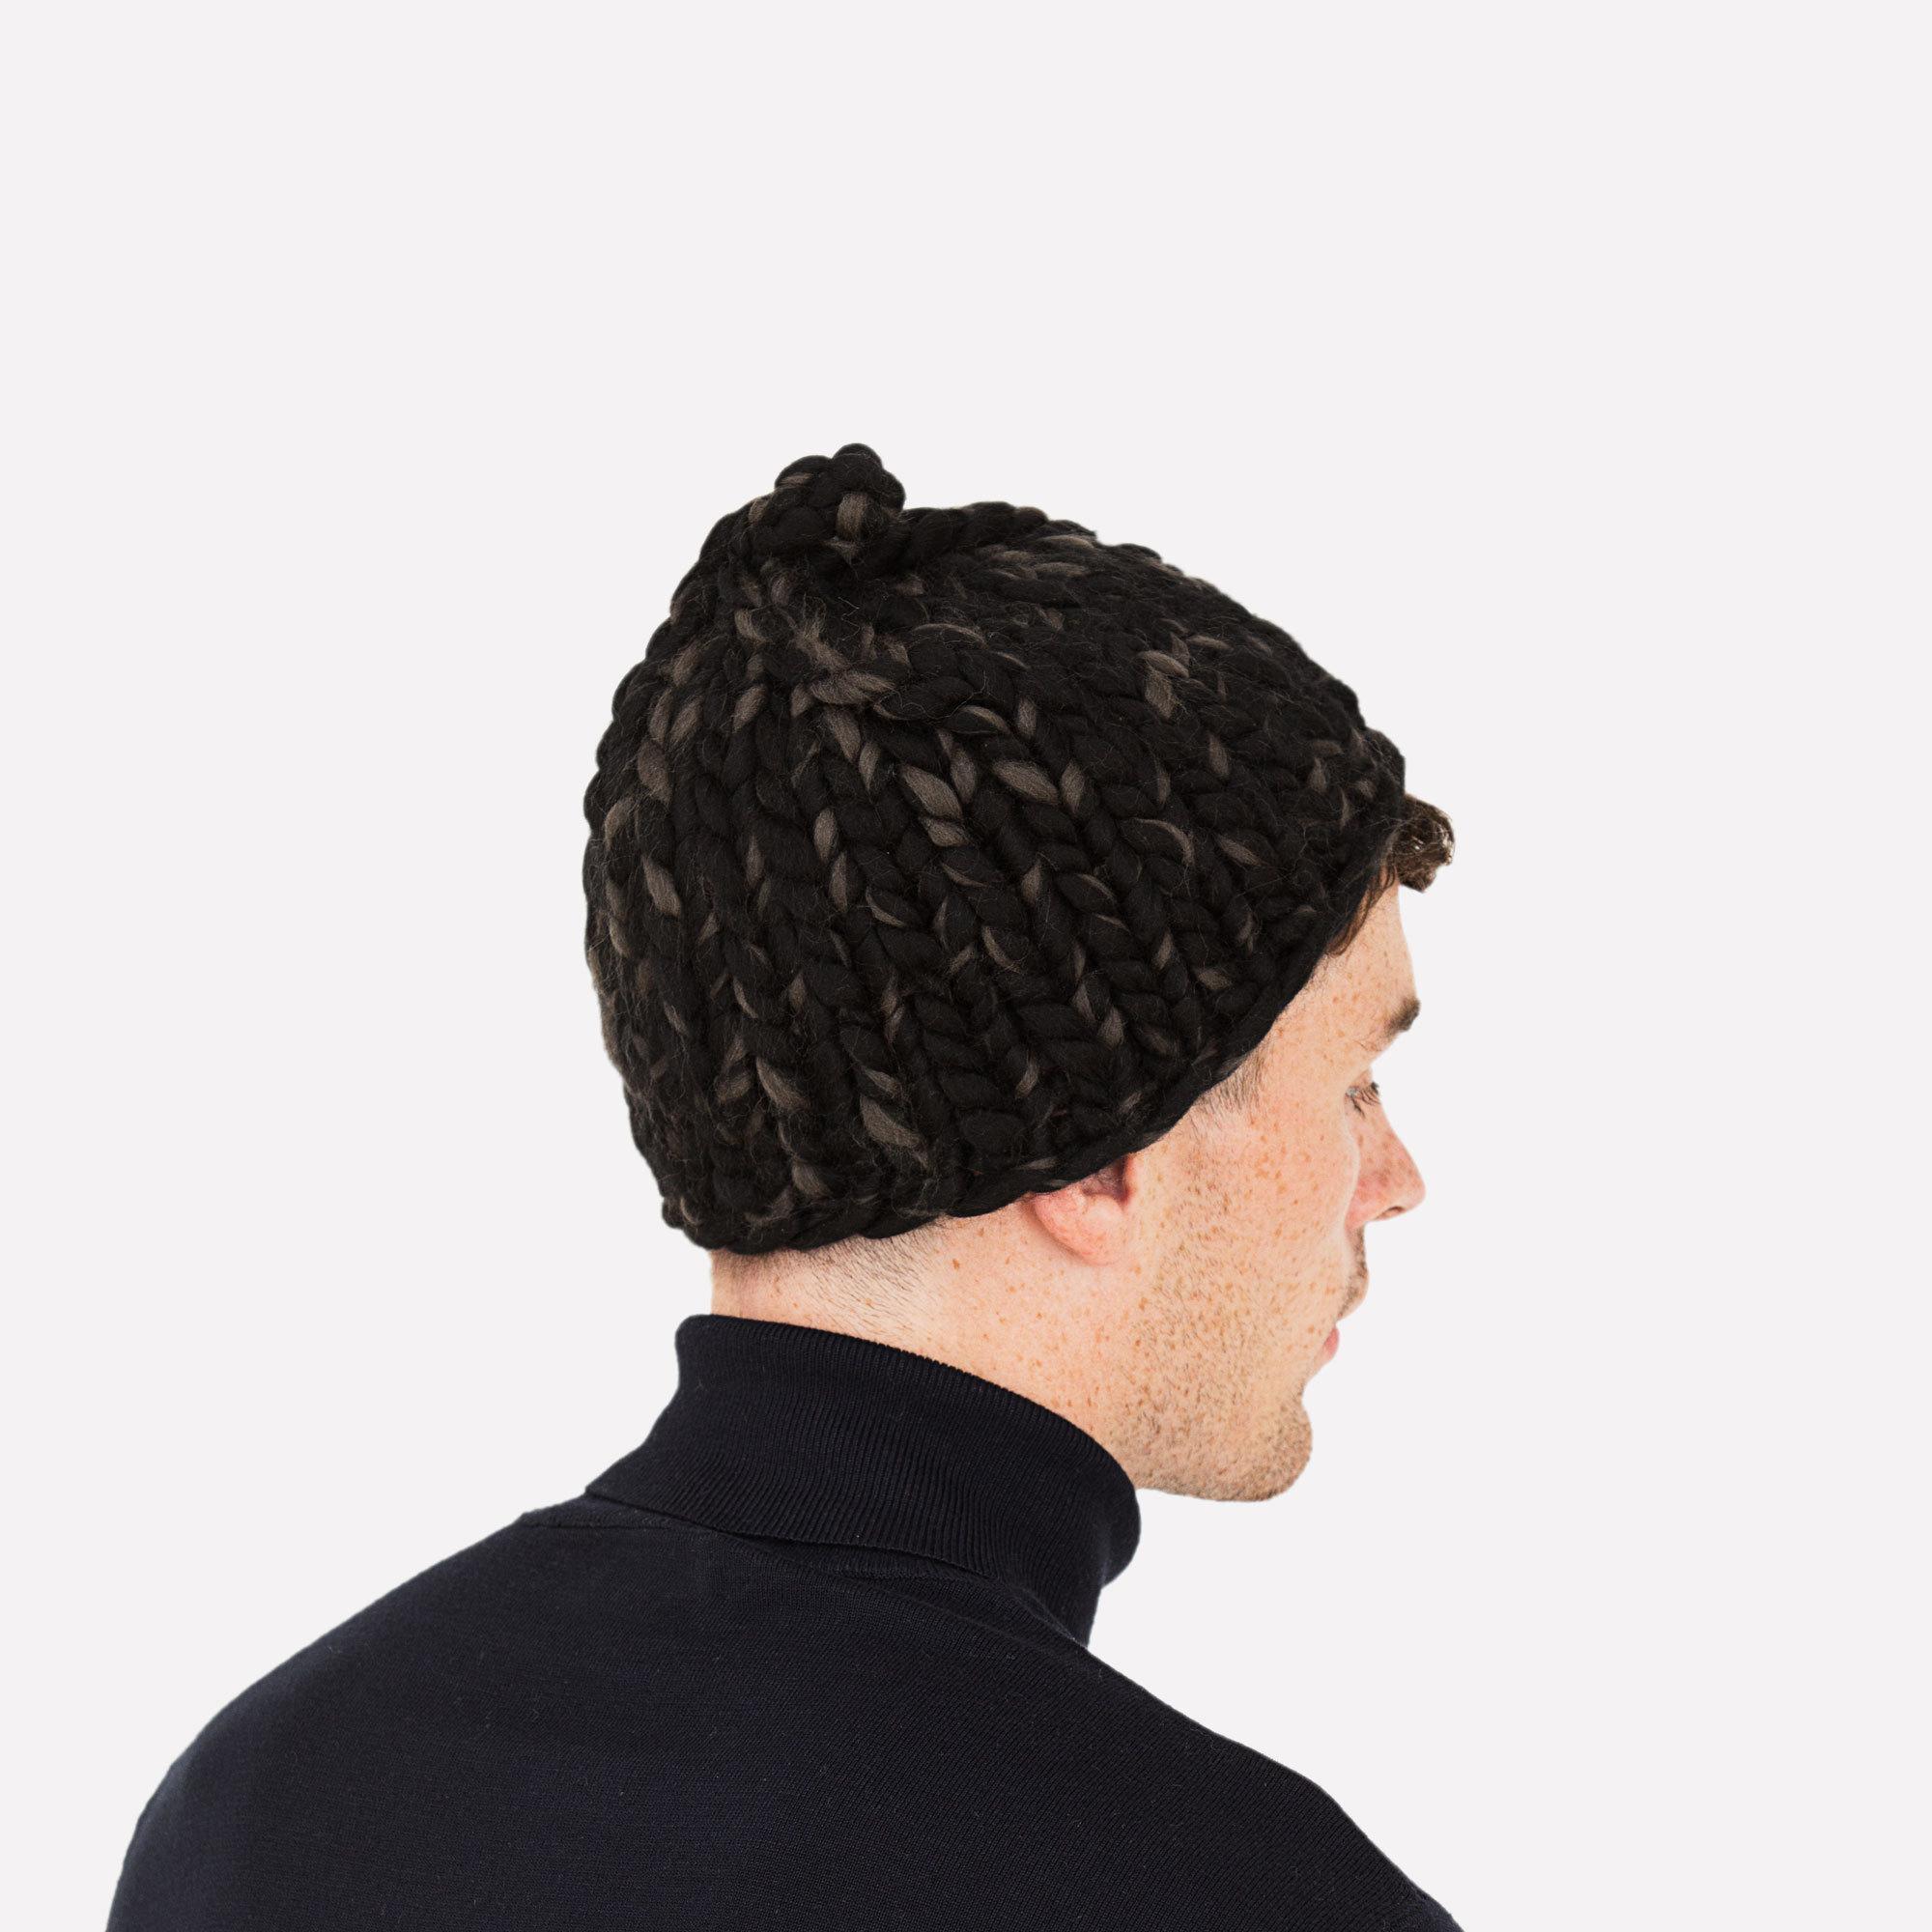 1114b0ba460 Men s Beanie Black and Carbon Hand-Crocheted Merino Wool Hat